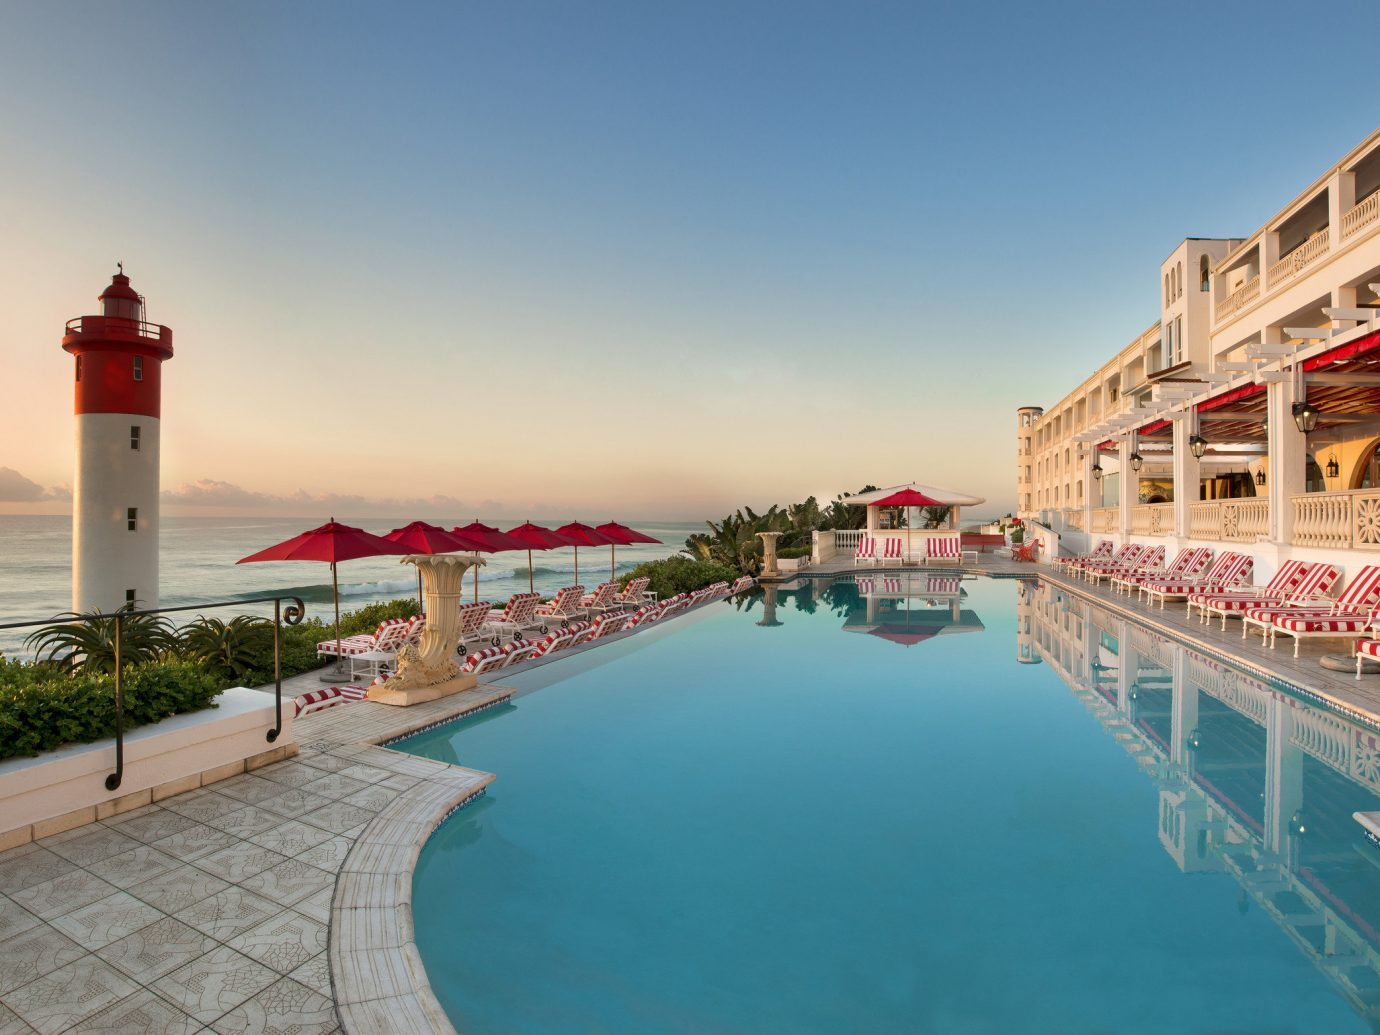 Hotels outdoor sky water vacation walkway Sea tower Beach Coast Resort